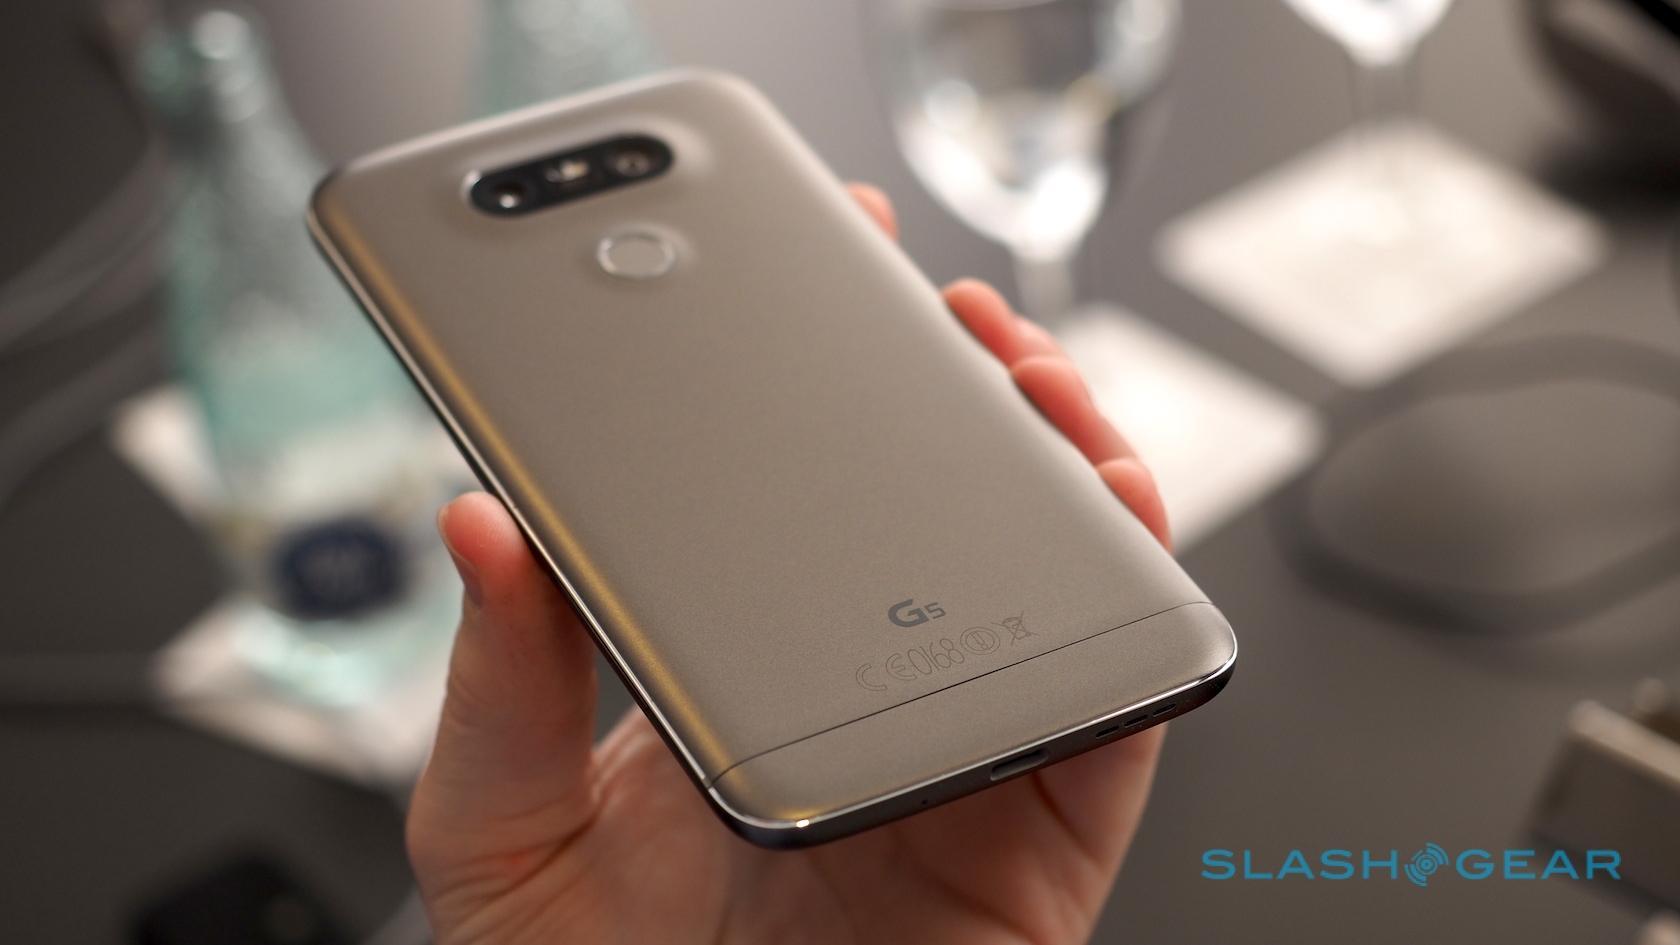 LG G5 hands-on: LG goes metal and modular - SlashGear